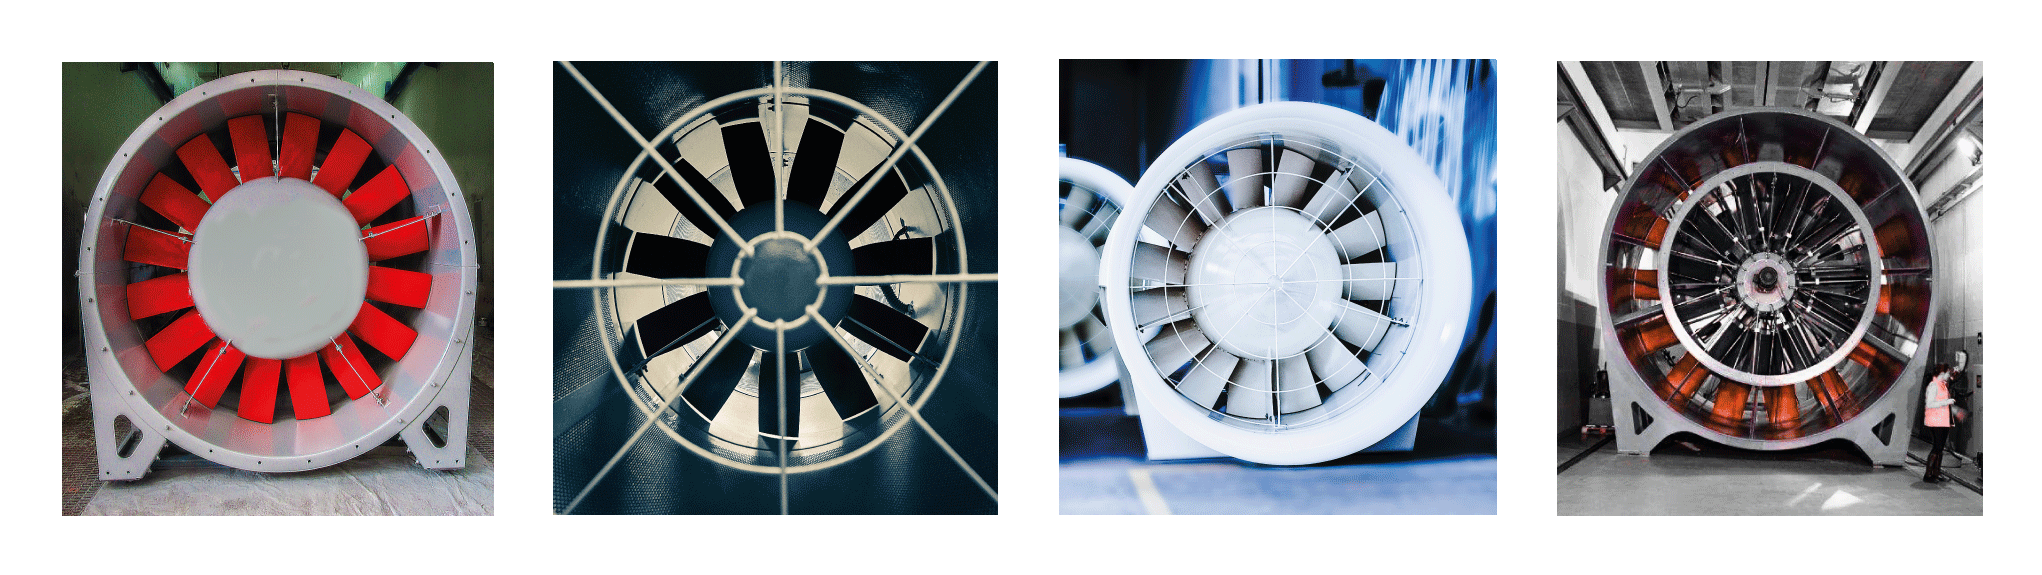 Zitrón products ventilation fans